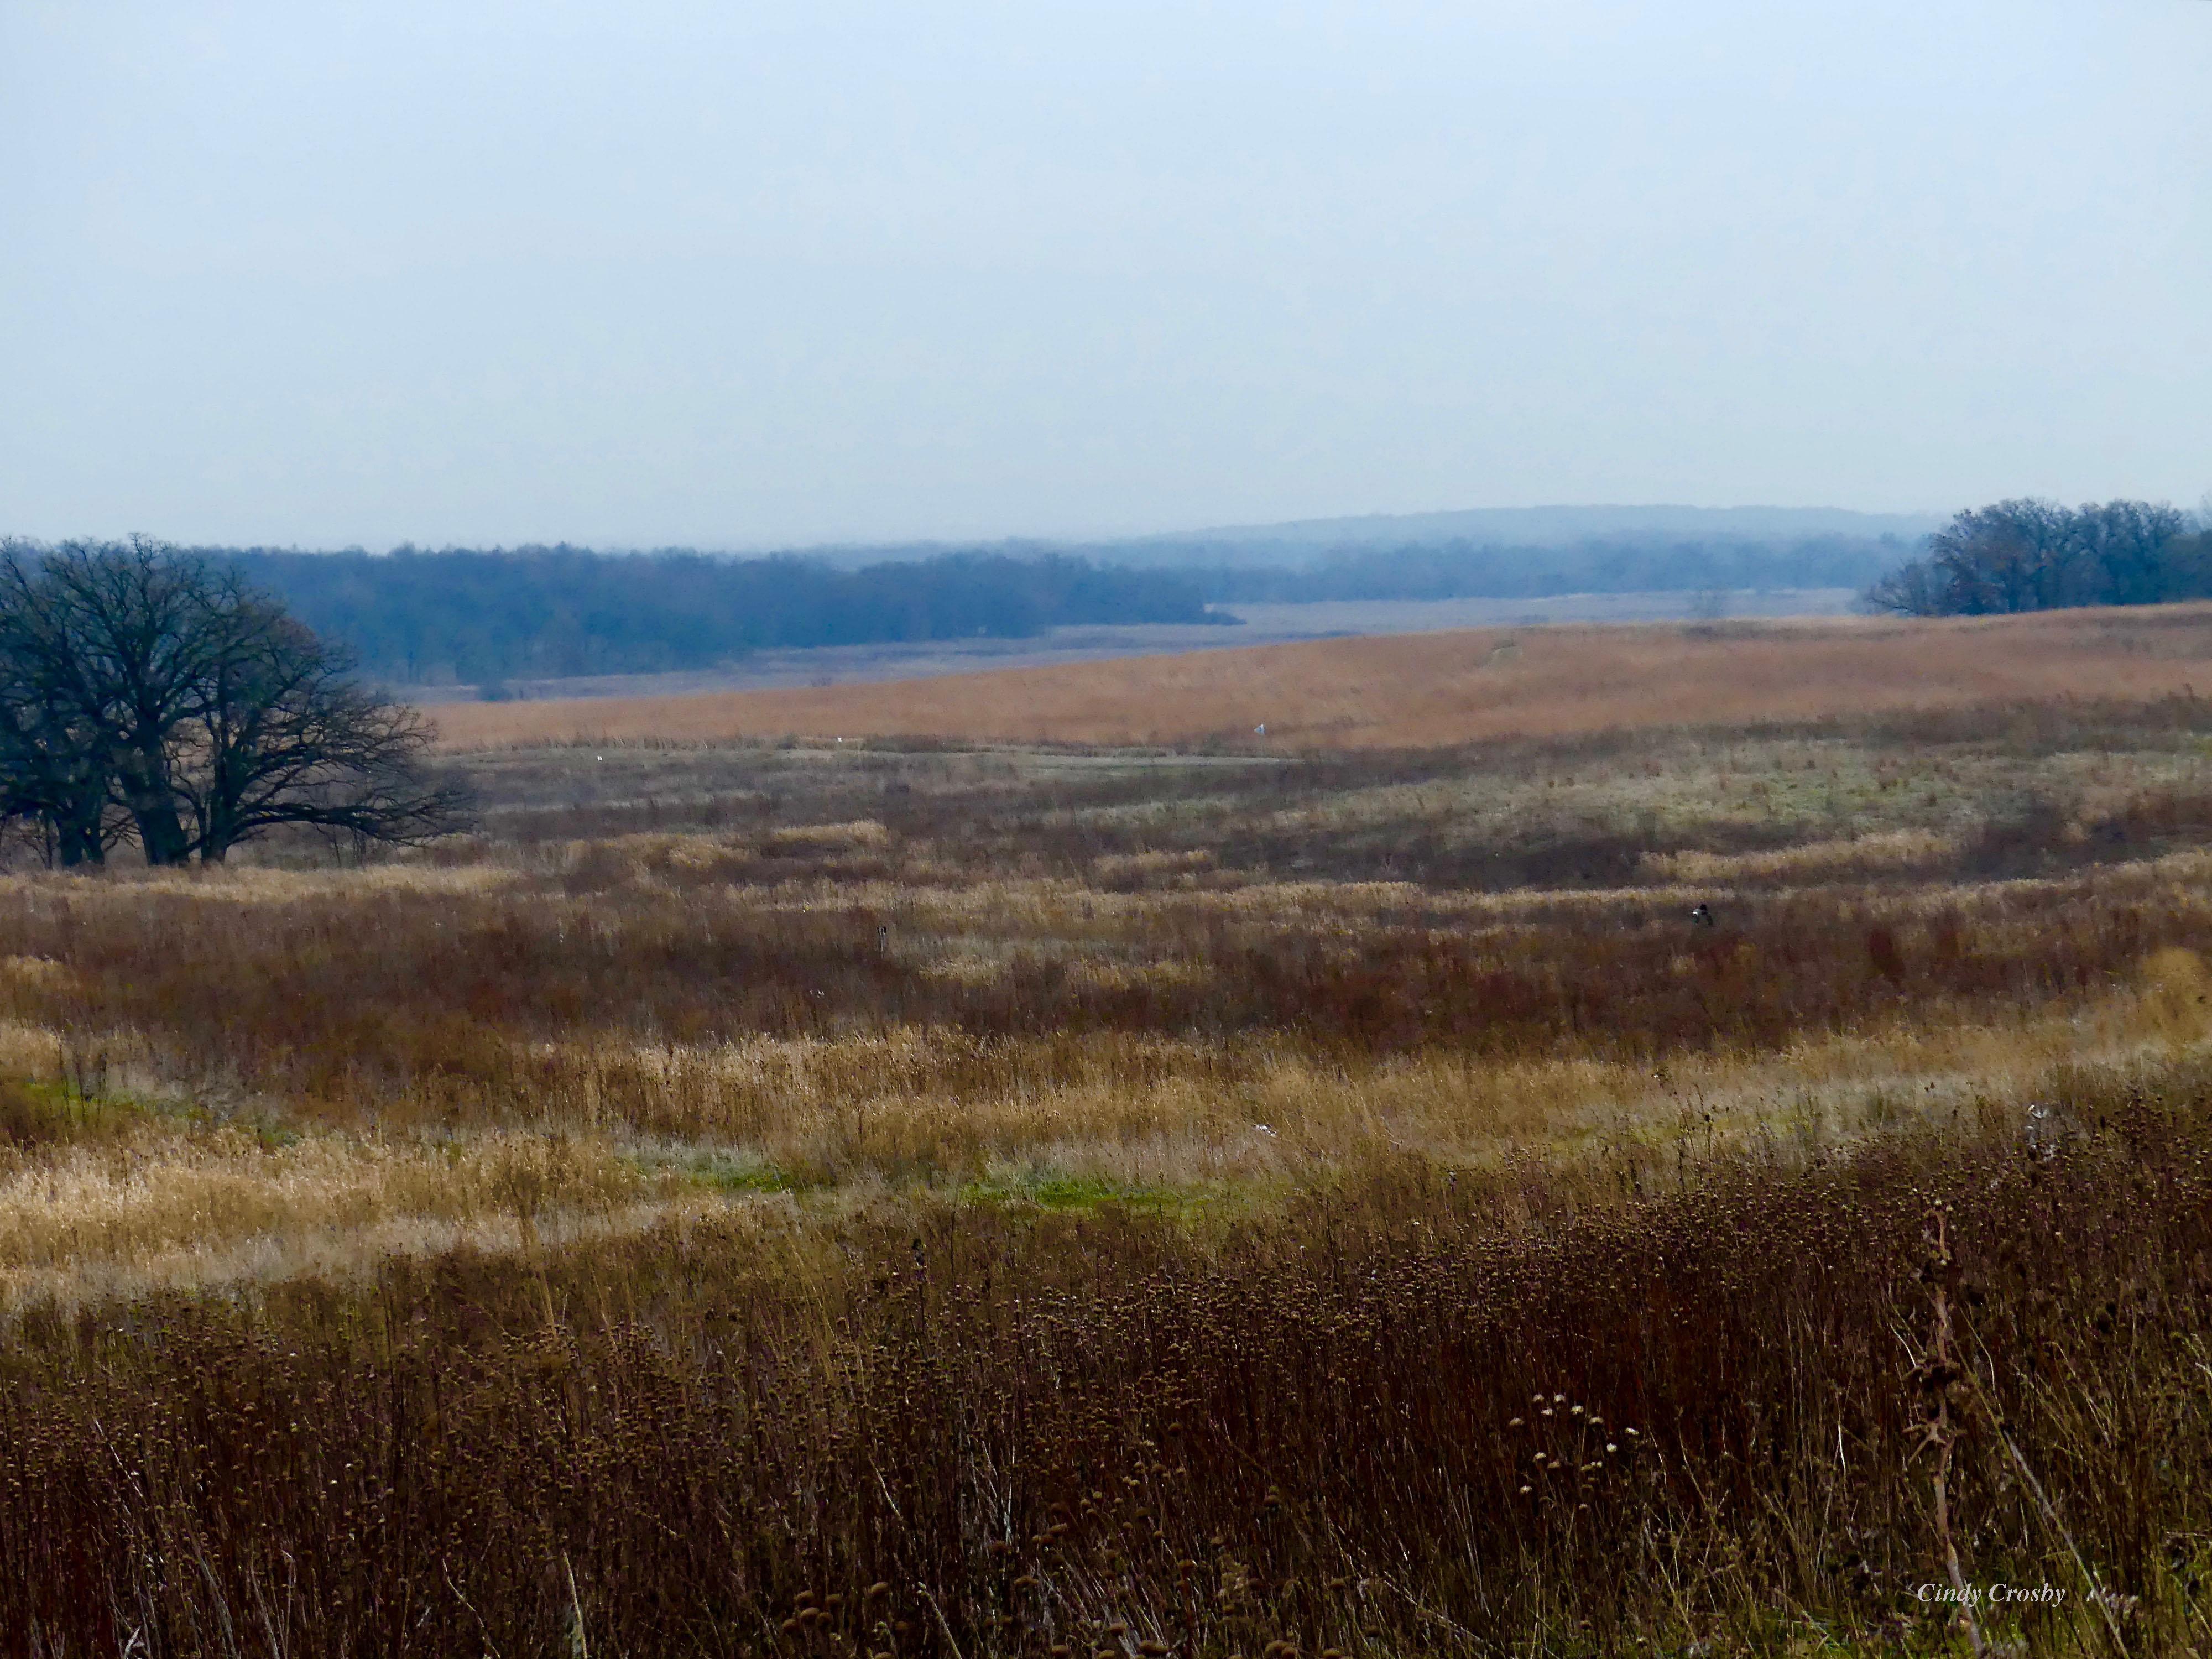 prairieviewlandscape12819WM.jpg